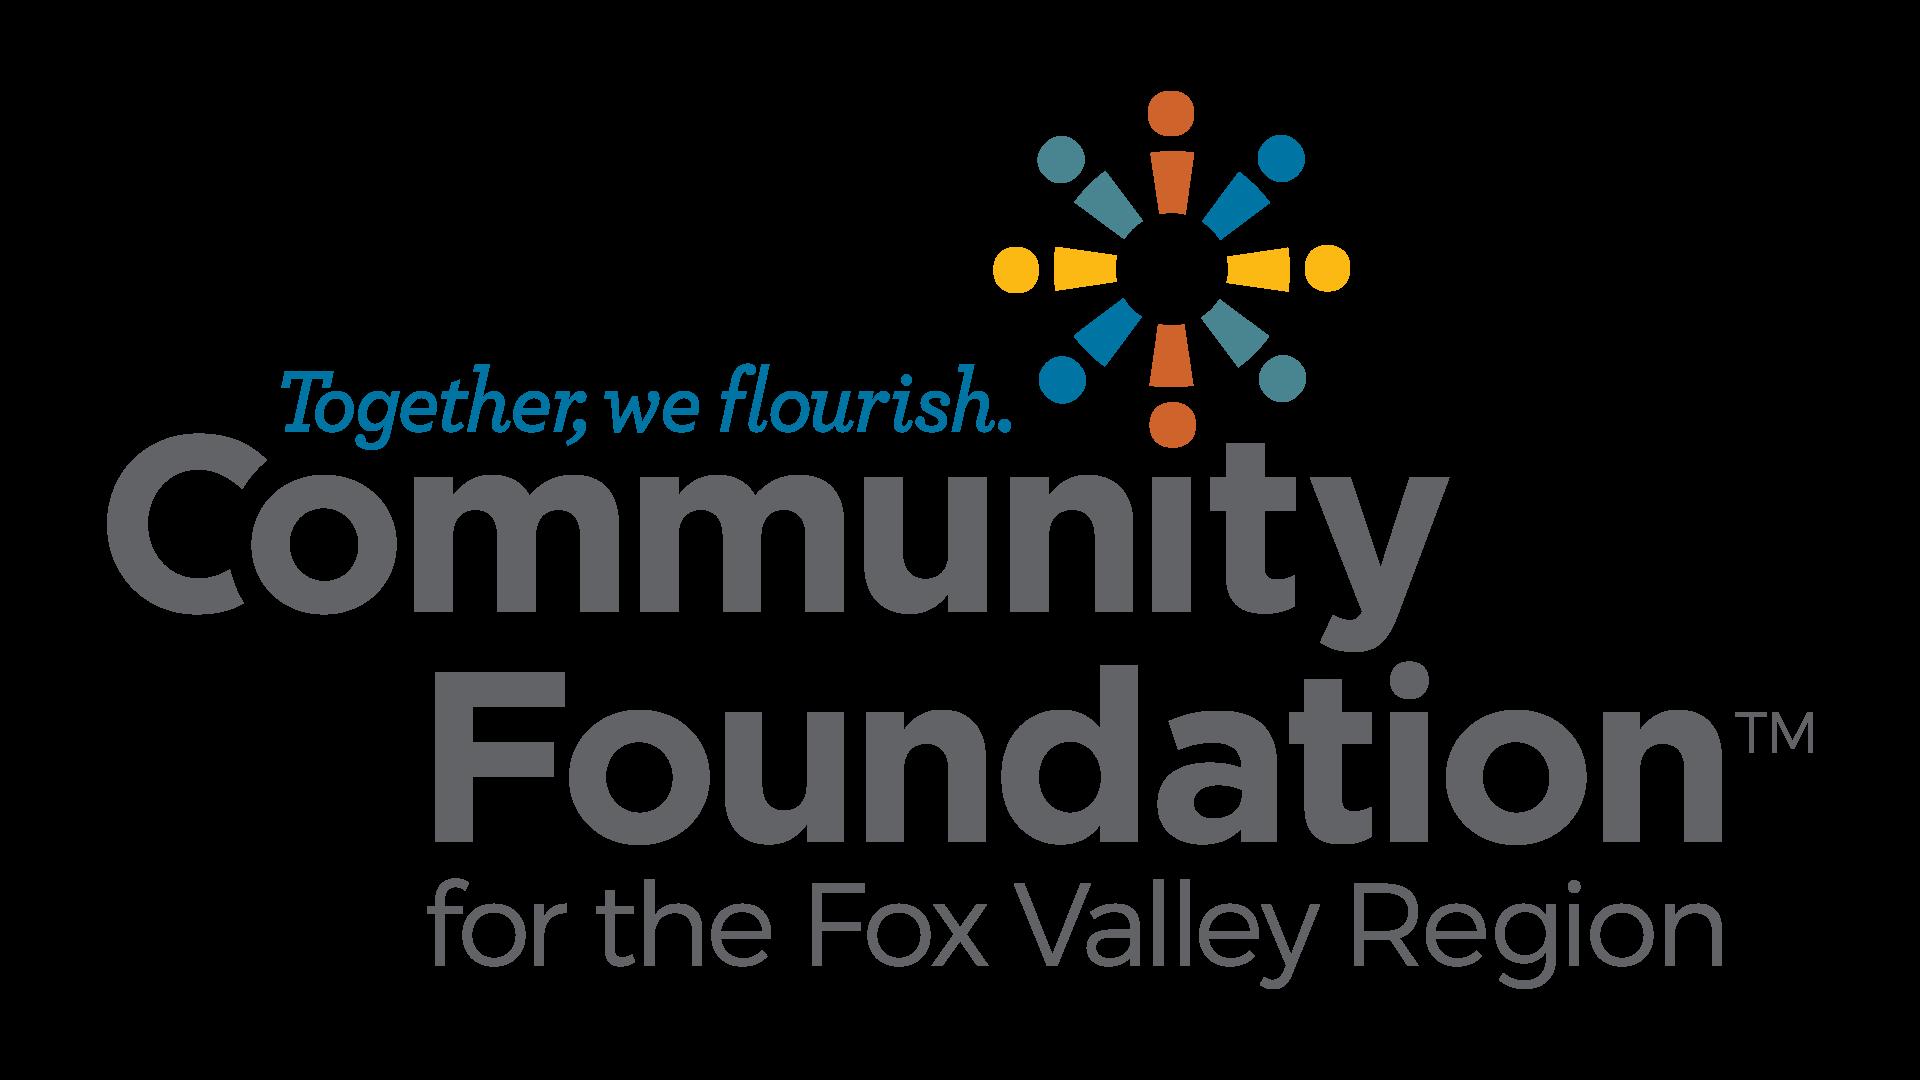 Community Foundation for the Fox Valley Region. Together, we flourish.